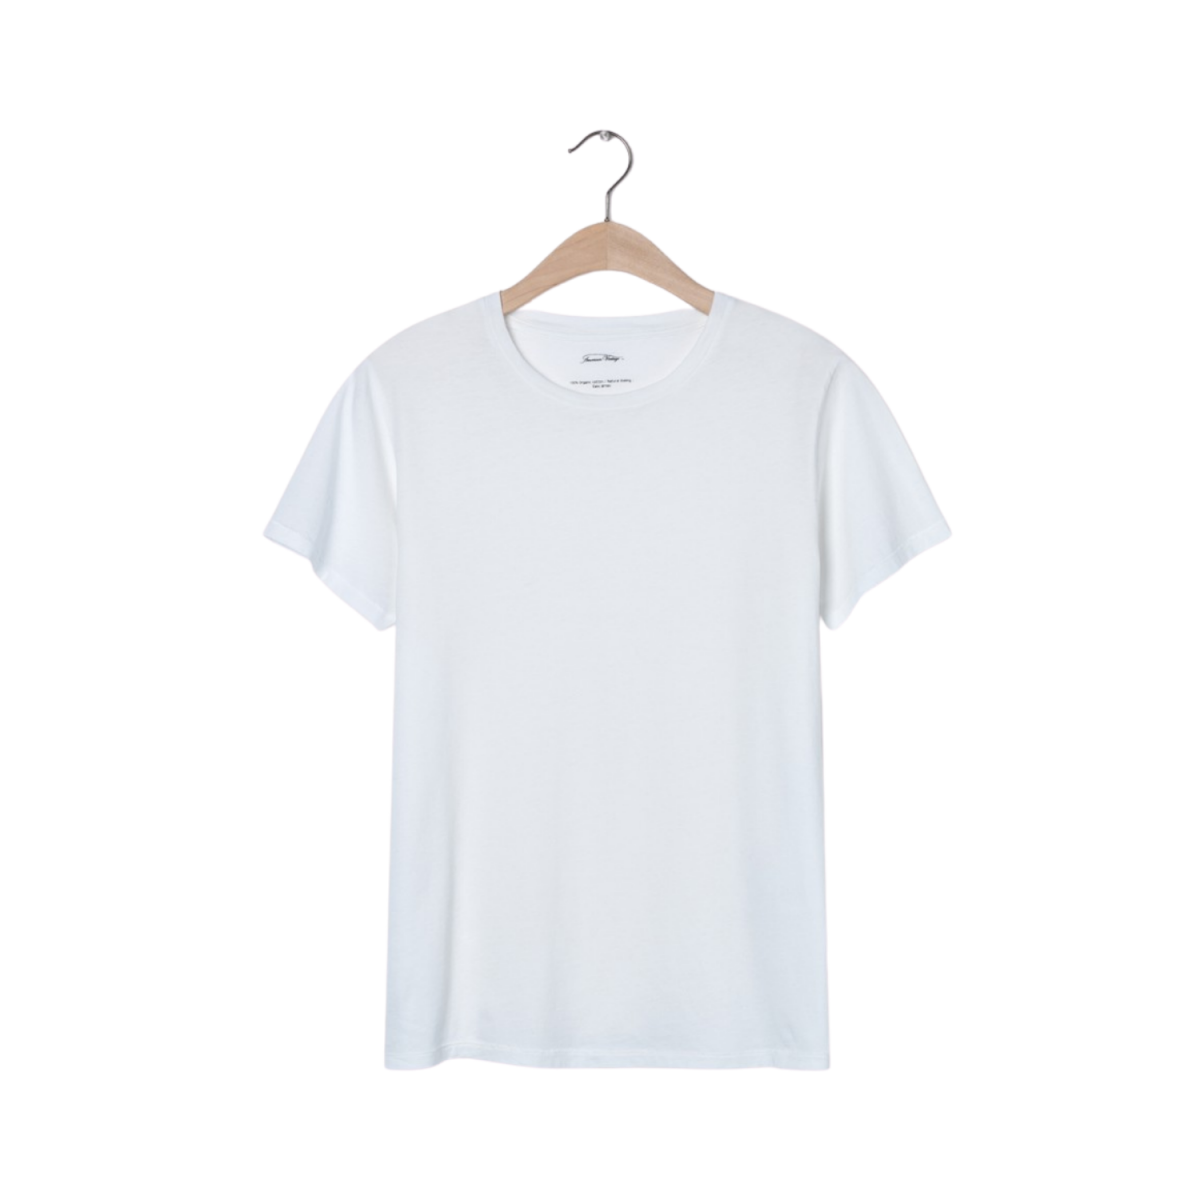 vegiflower t-shirt - blance